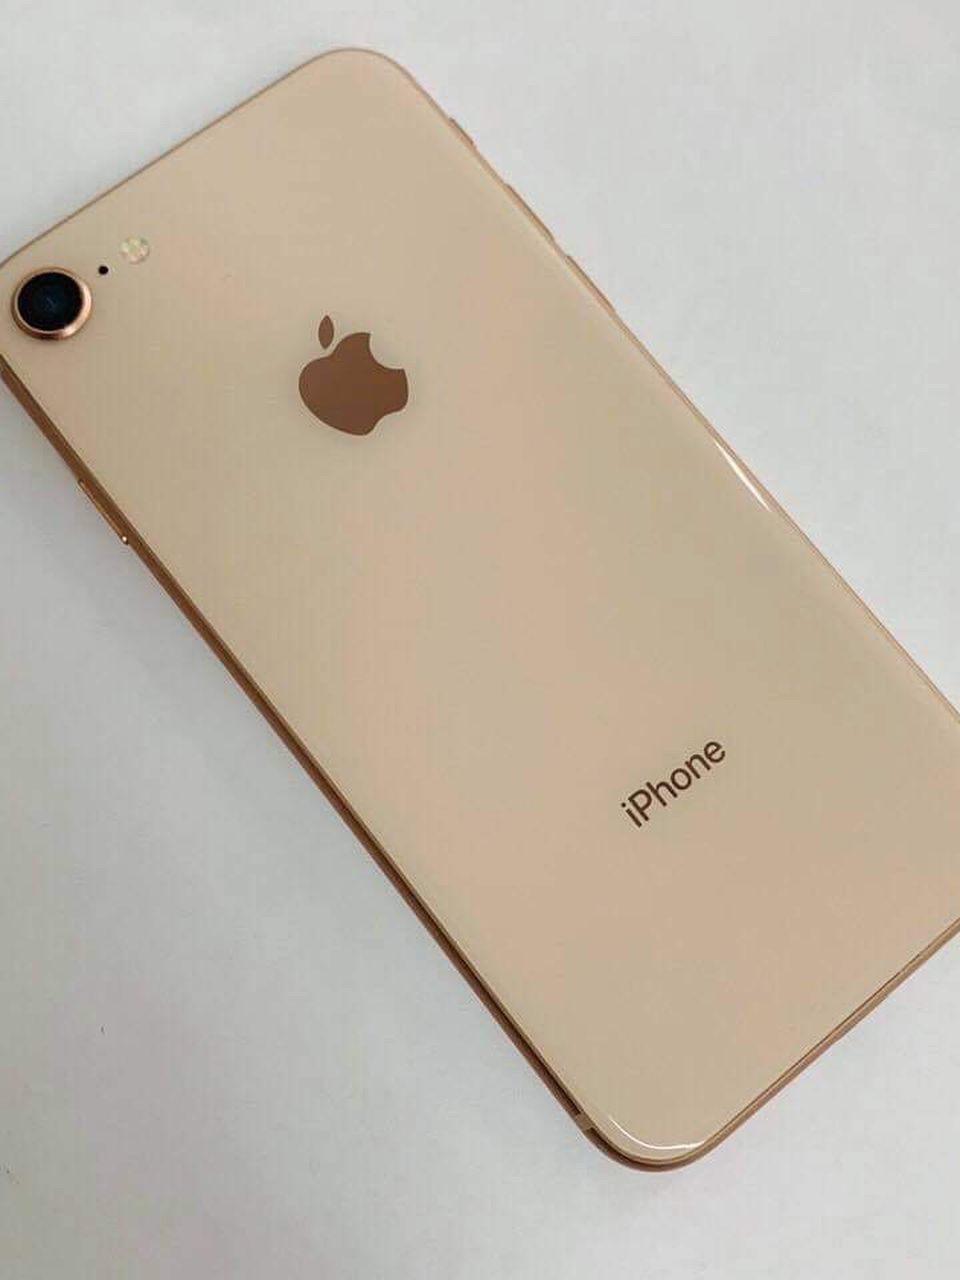 iPhone 8 (64 GB) Unlocked With Warranty